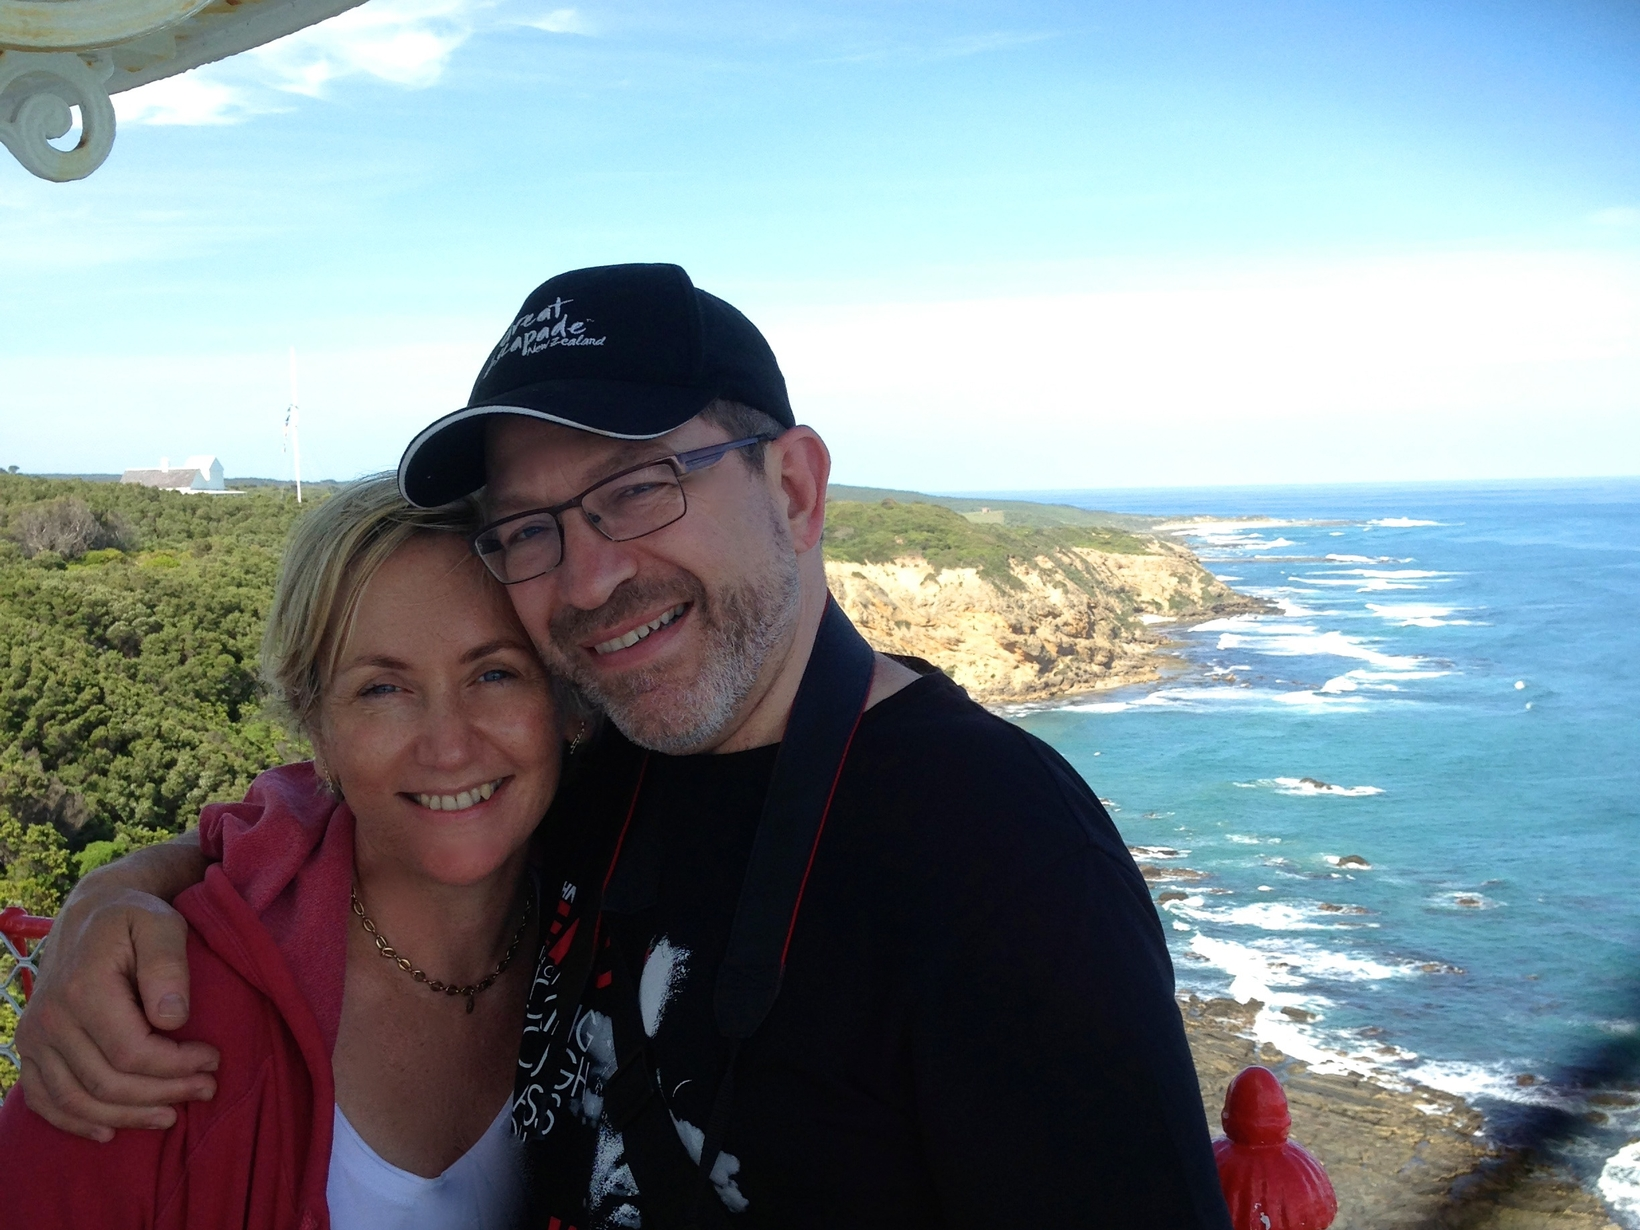 C & John from Melbourne, Victoria, Australia